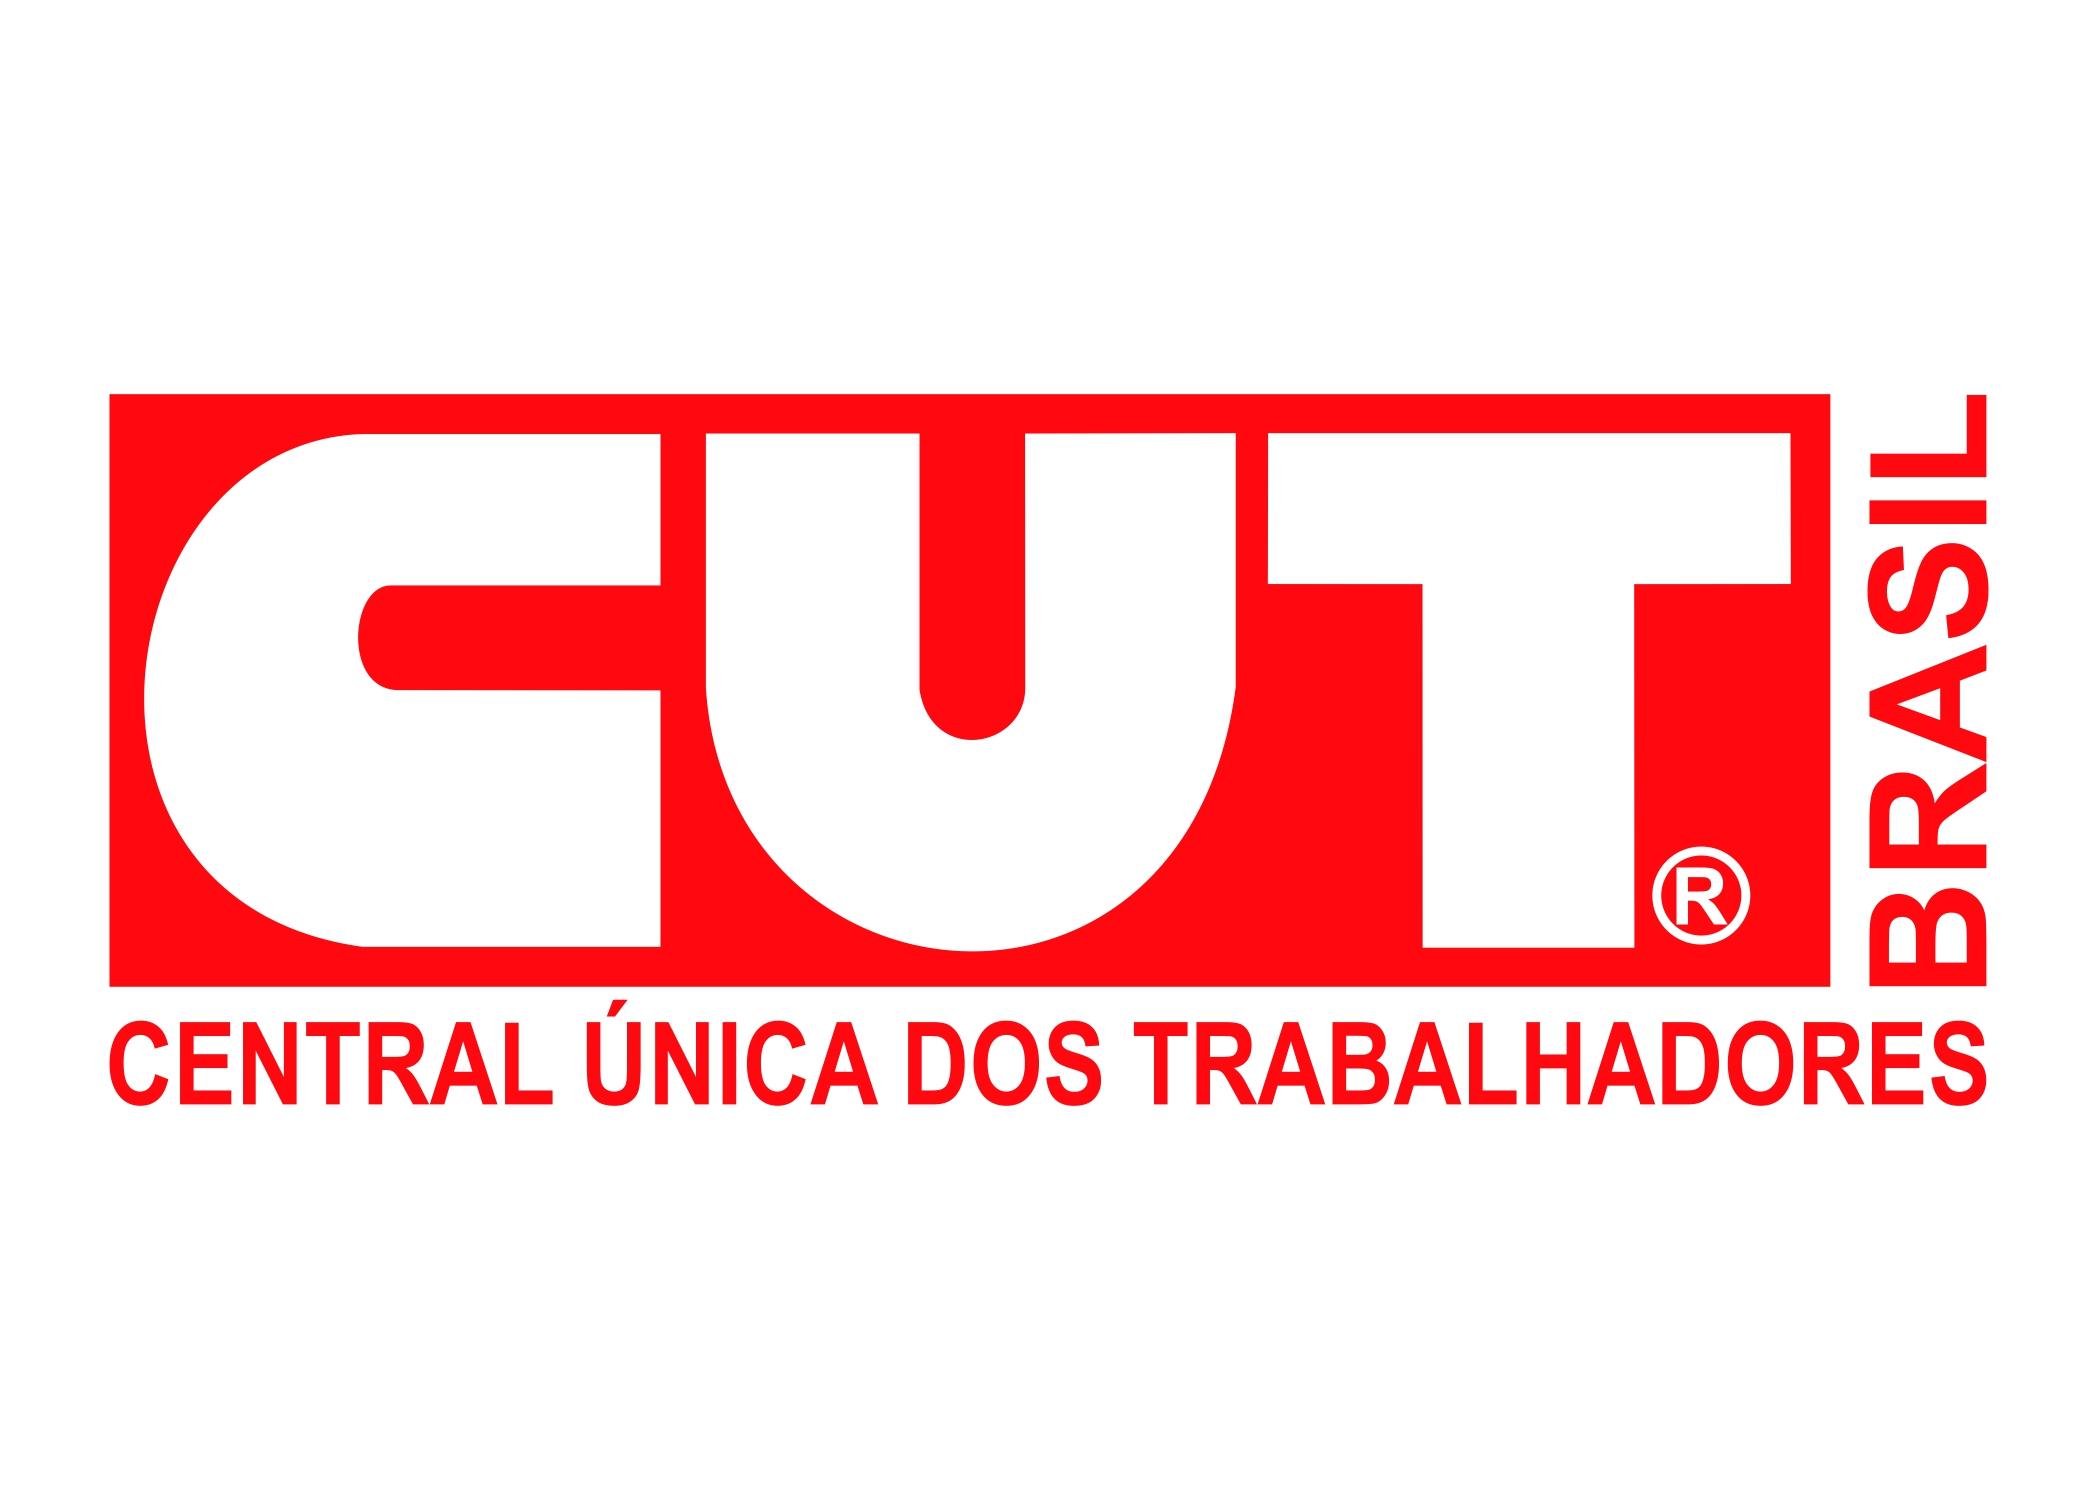 cut logo 4 - Central Única dos Trabalhadores Logo - CUT Logo